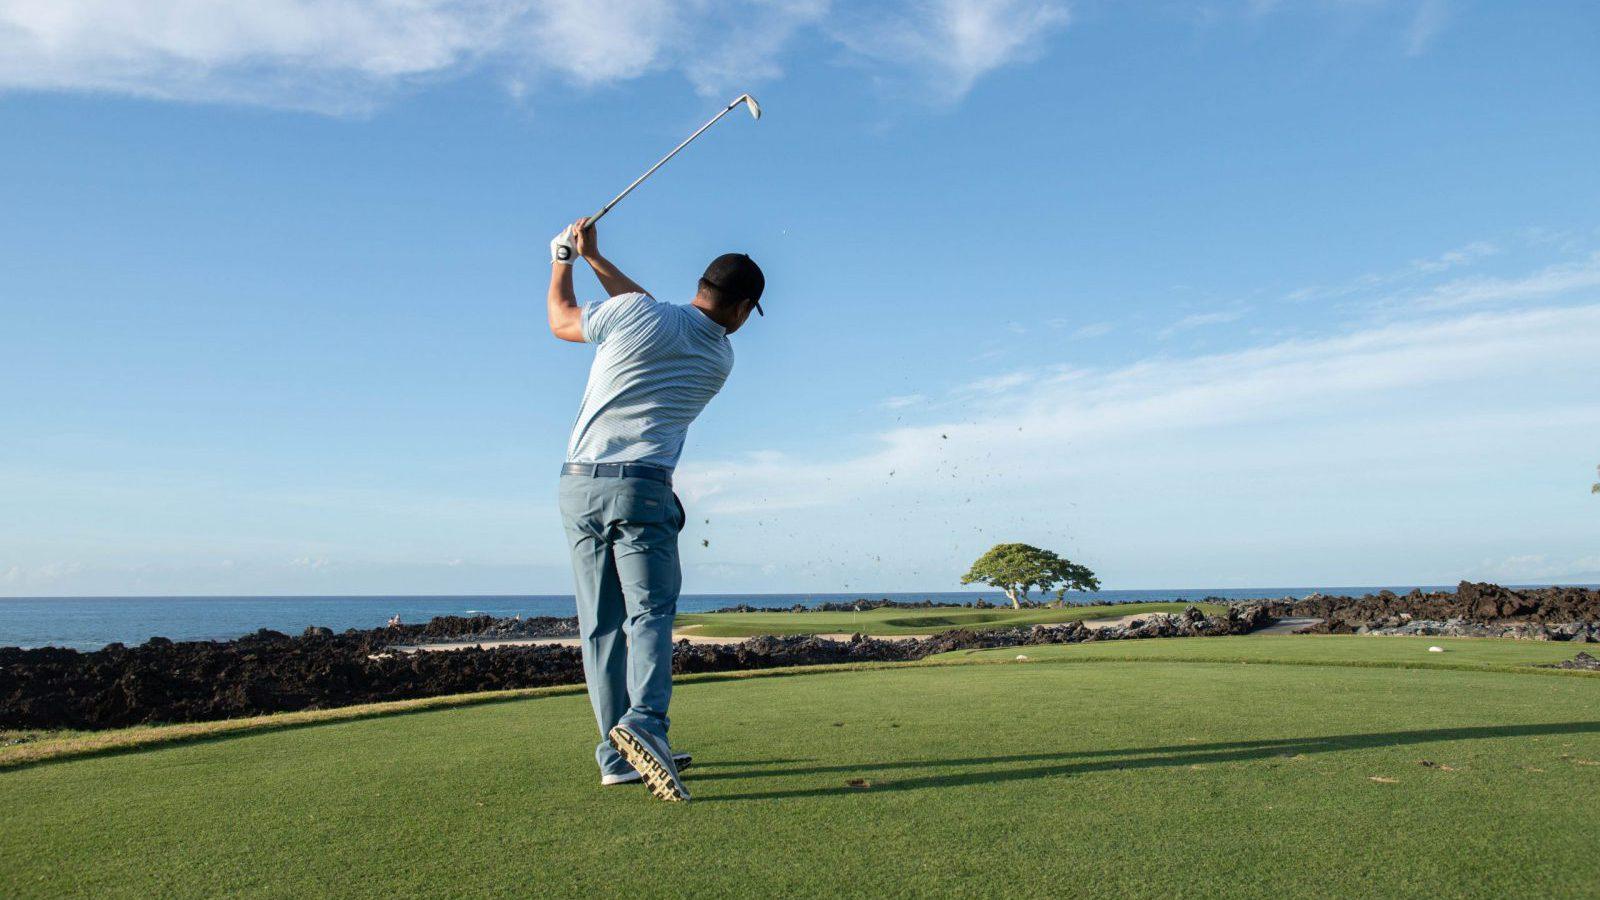 Garratt Okamura golf pro hits golf ball looking towards a blue sky and the ocean